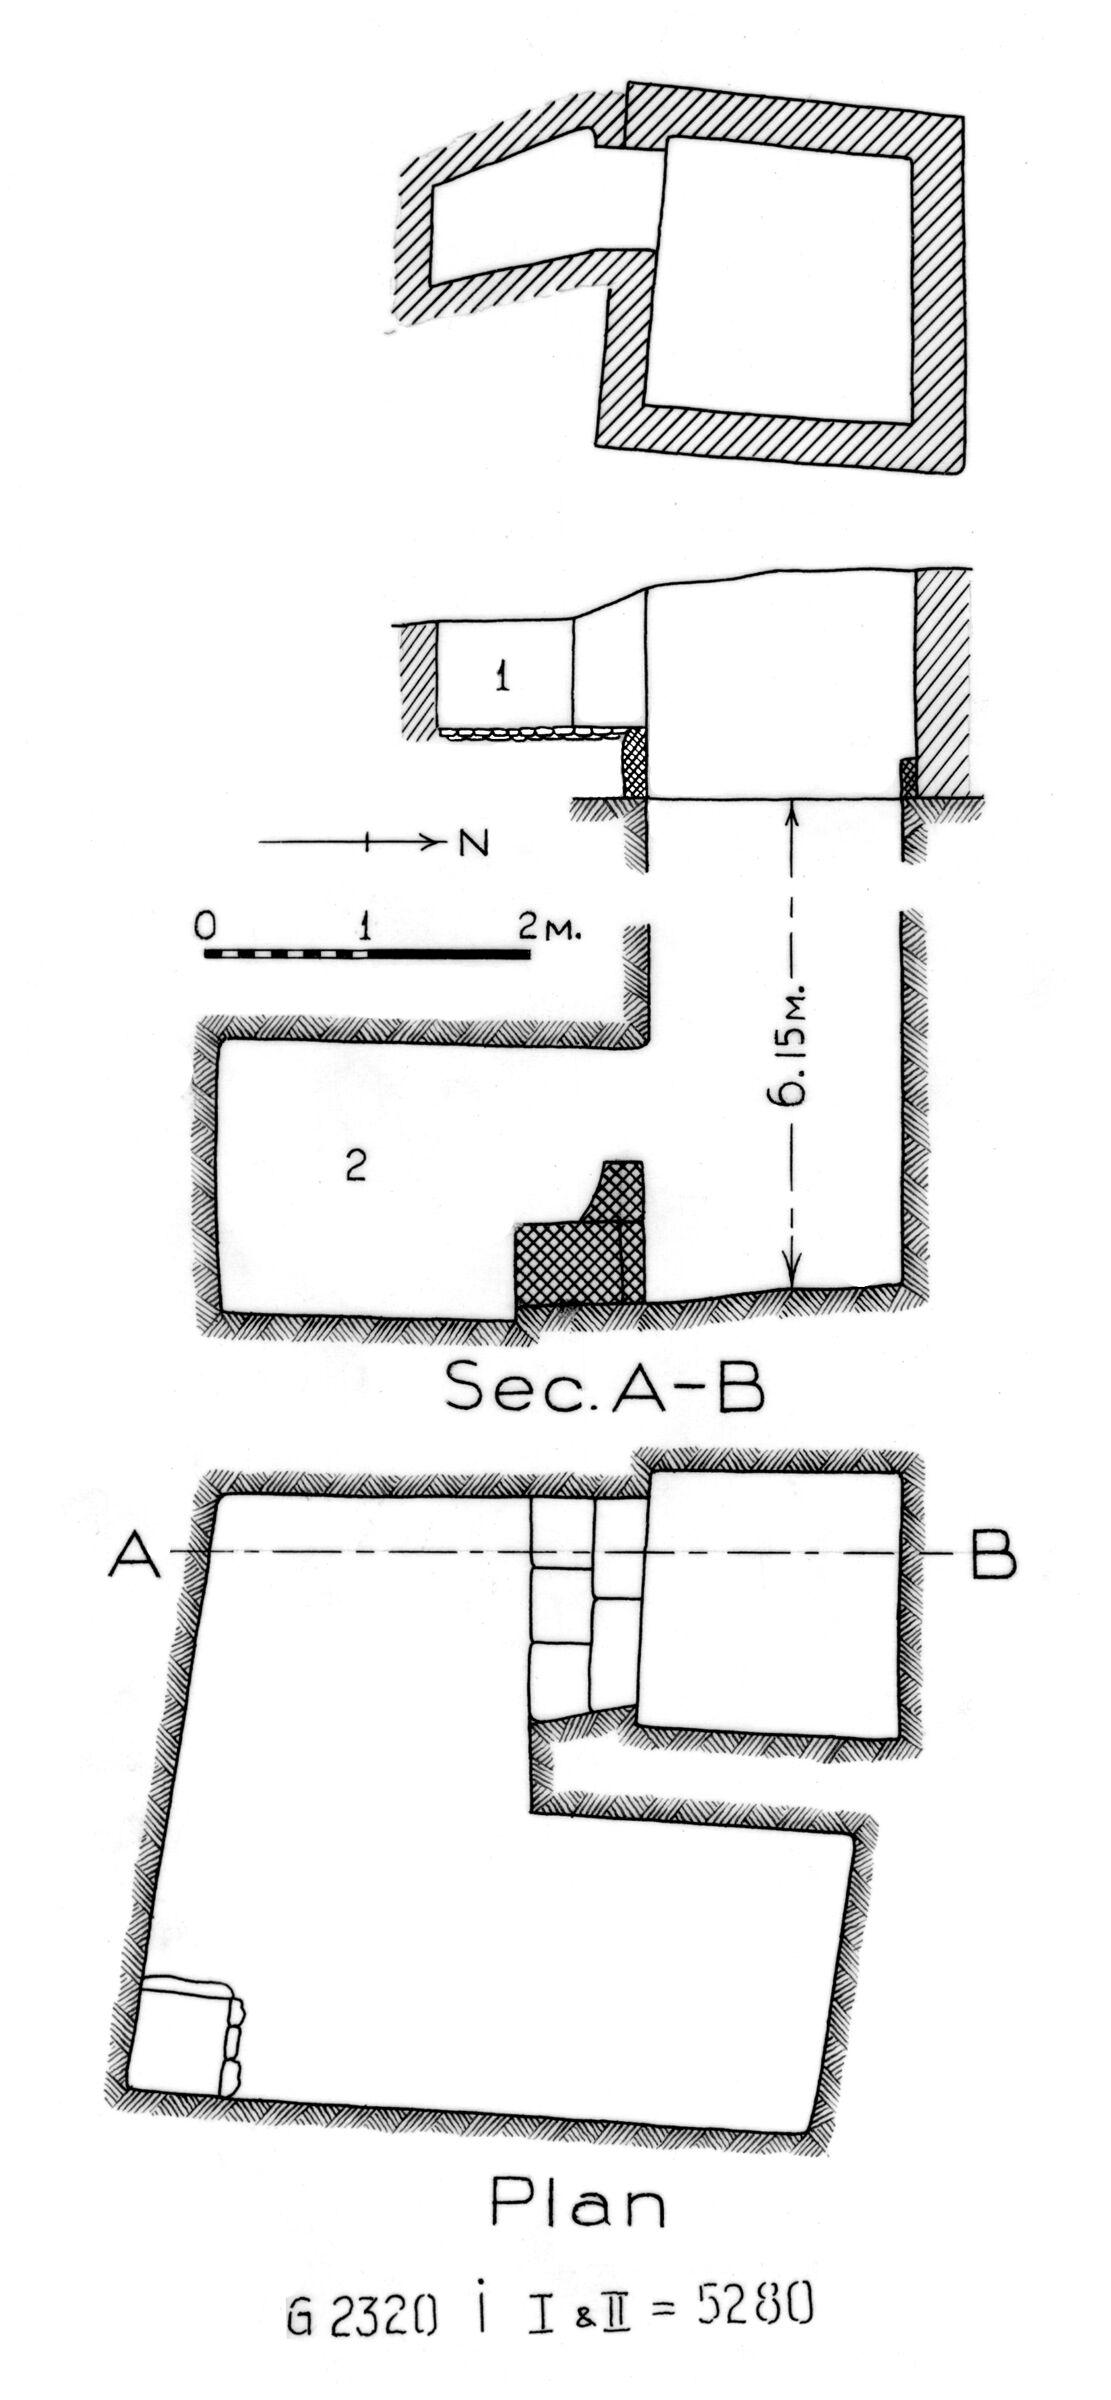 Maps and plans: G 2320 = G 5280, Shaft I (I & II)